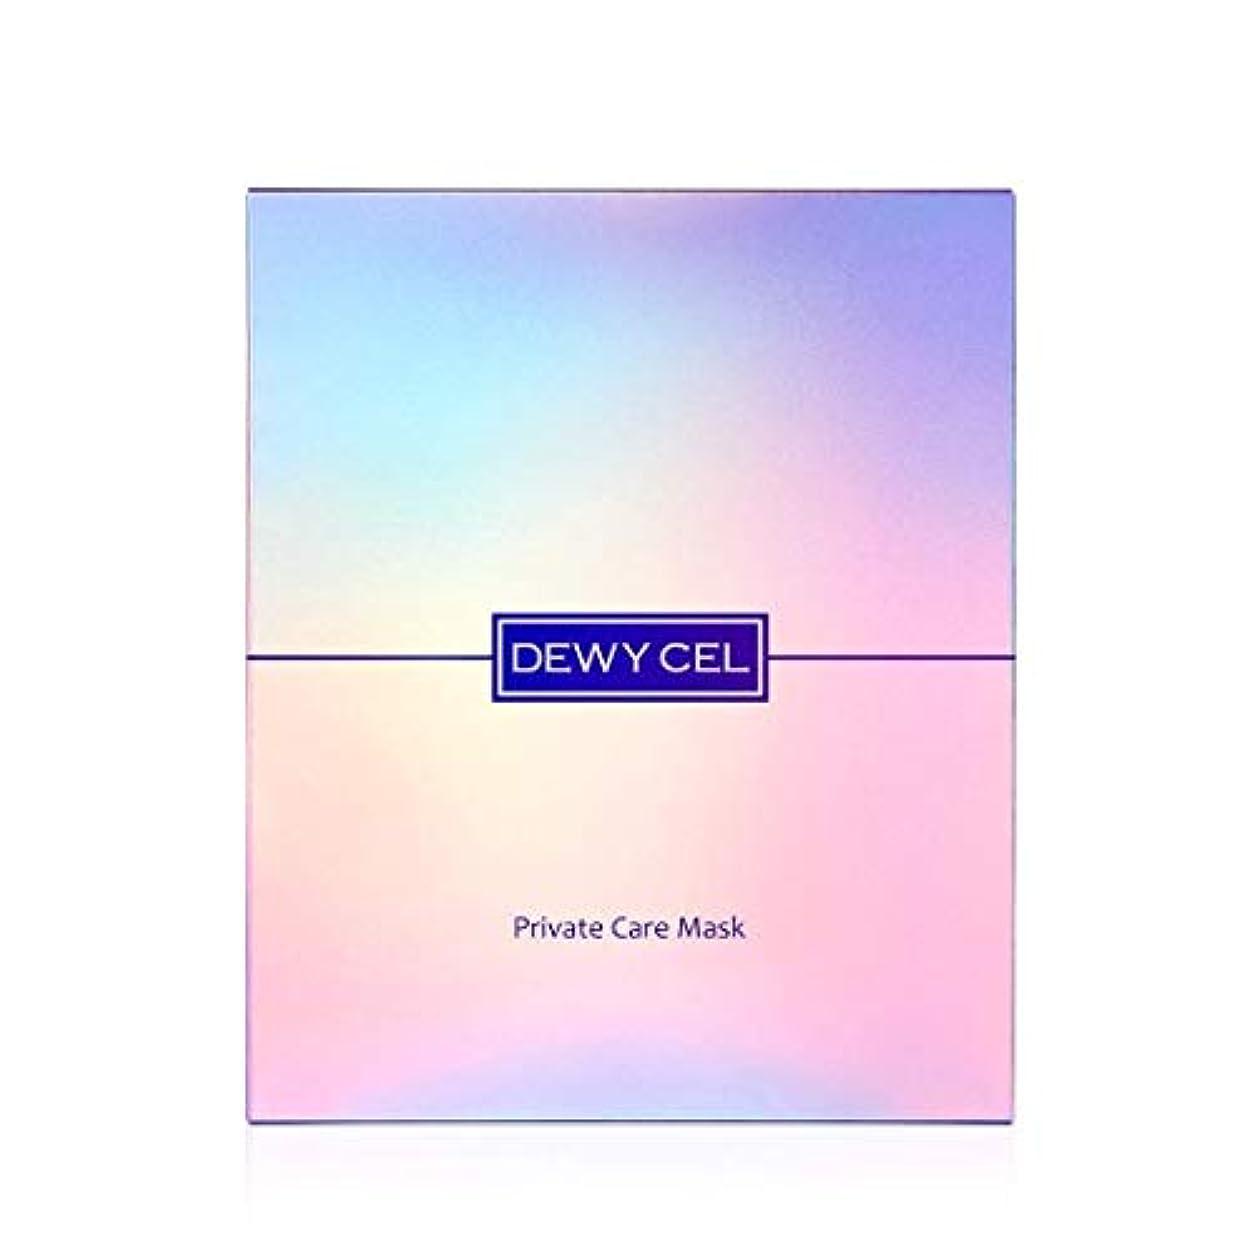 [DEWYCEL] Private Care Mask デュイセル プライベート ケアマスク [海外直送品] [並行輸入品]